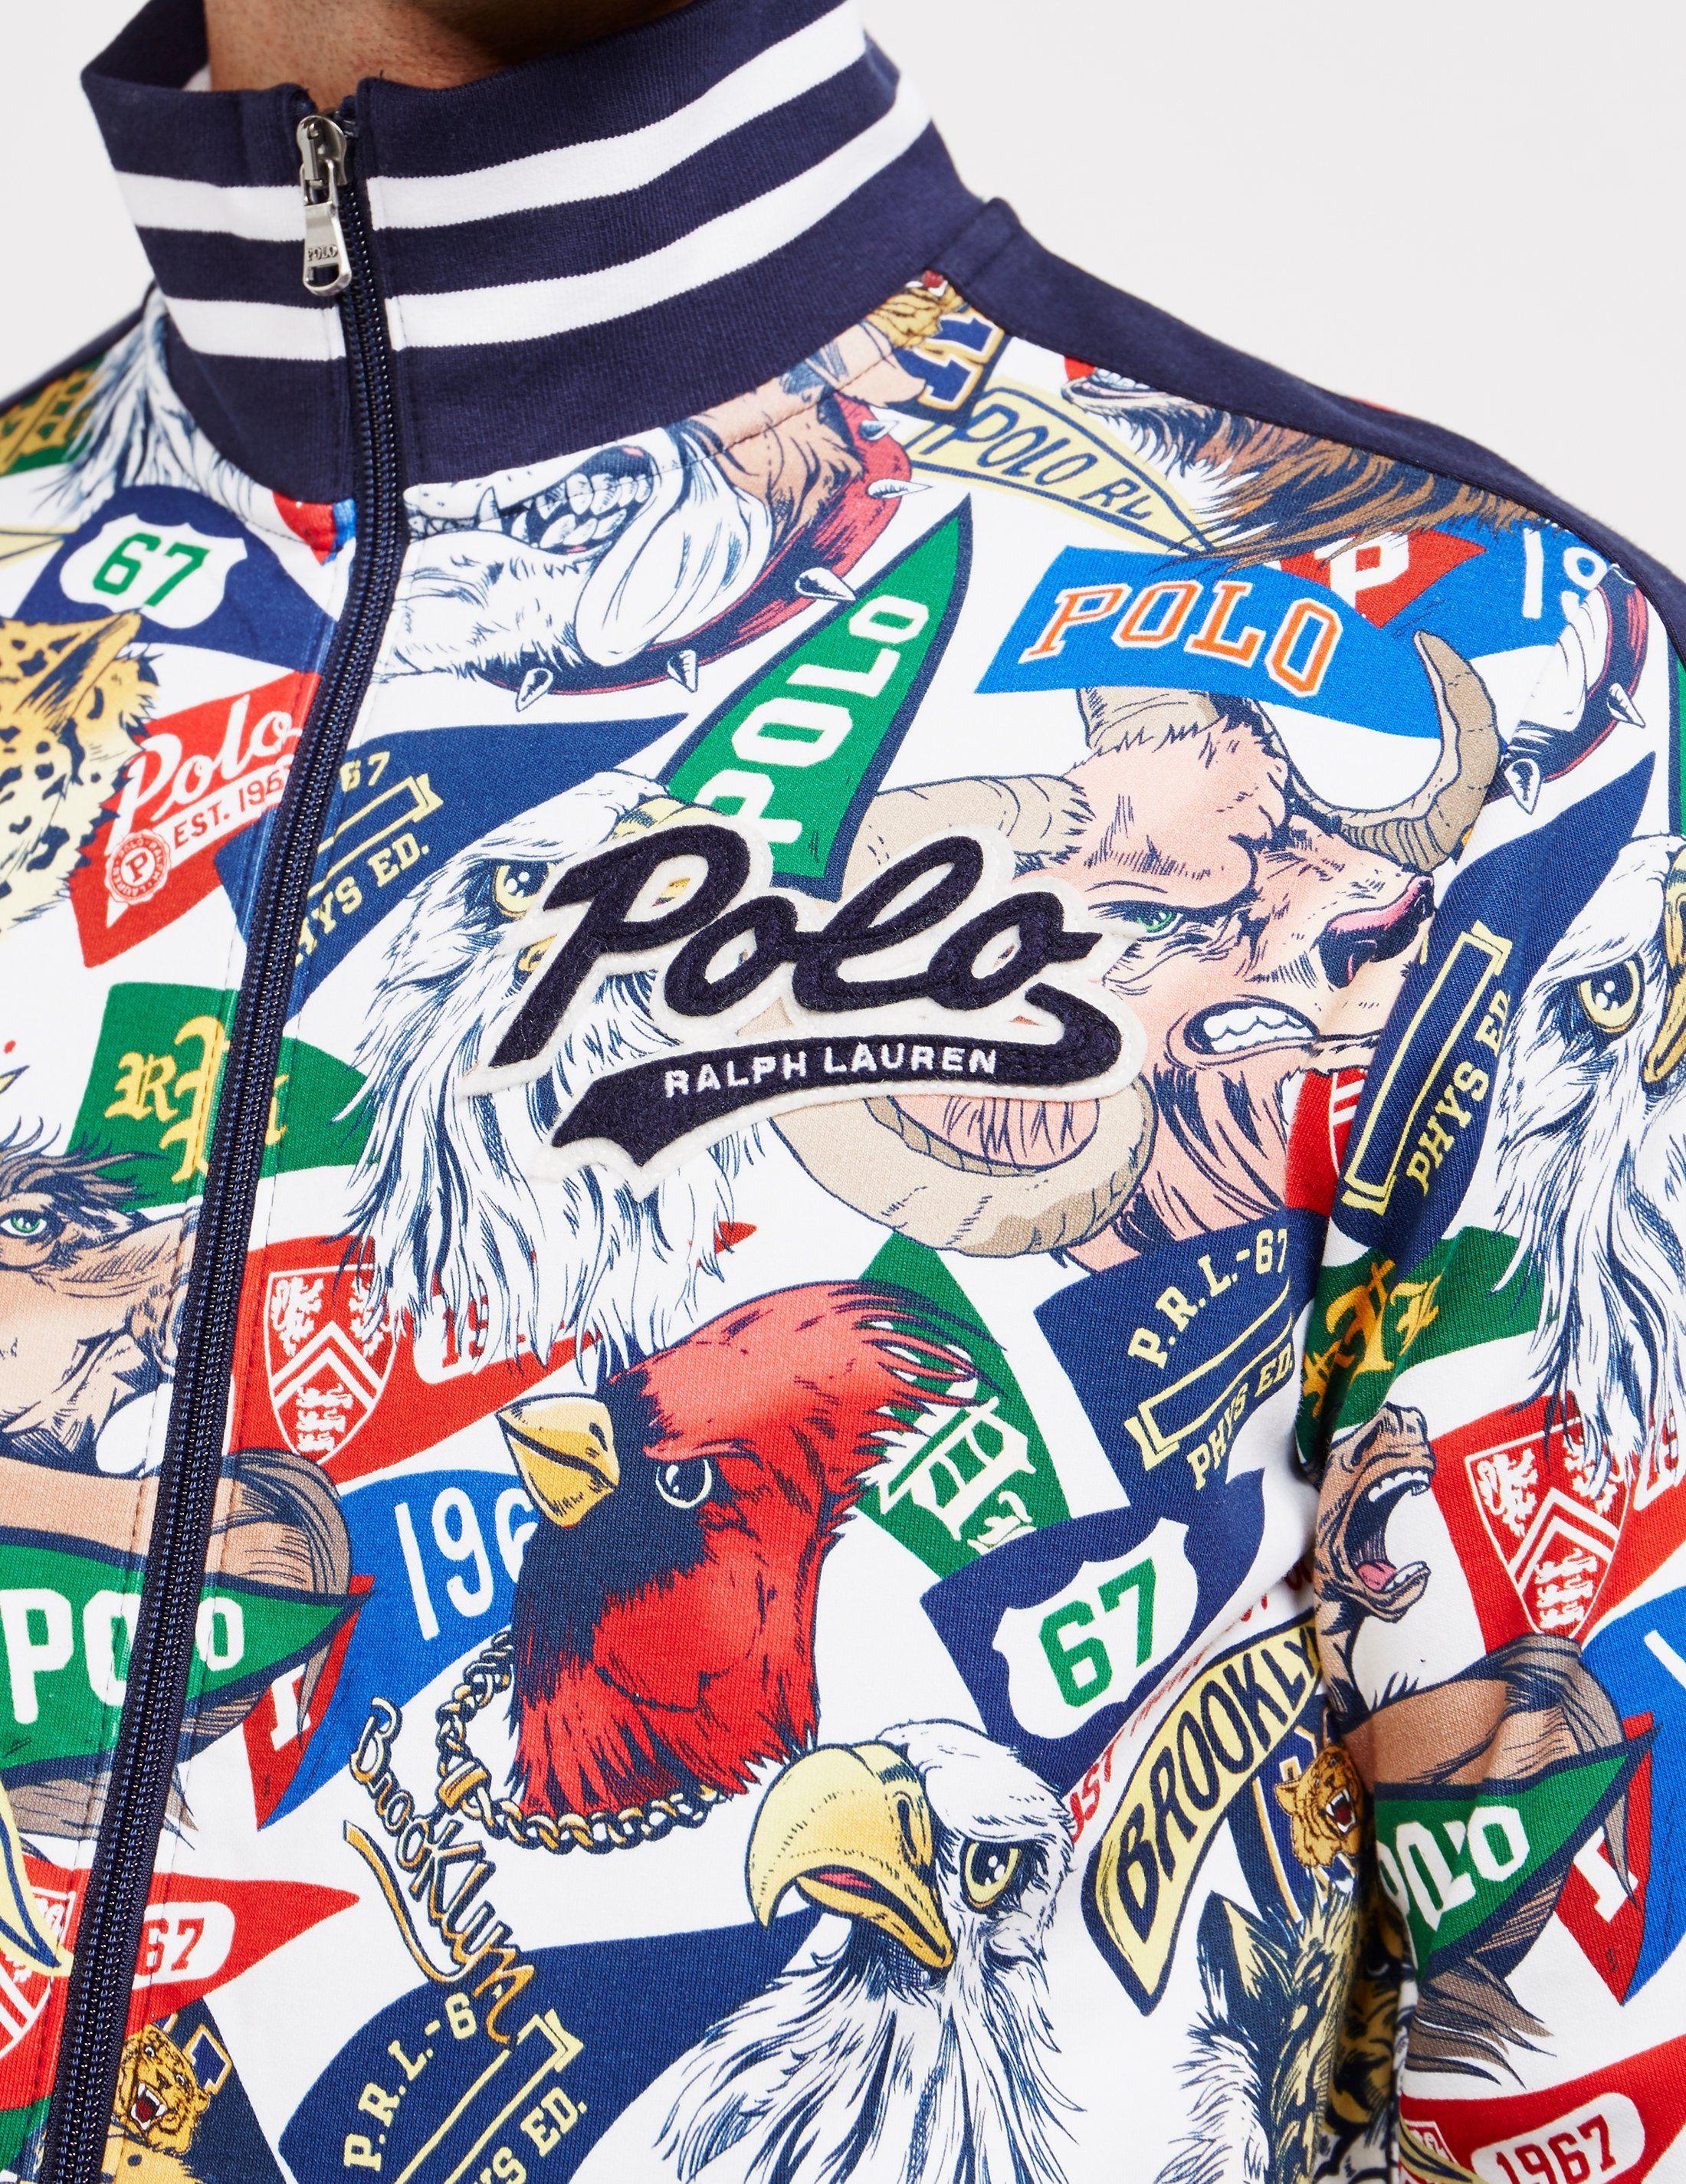 Polo Ralph Lauren All Over Mascot Track Top - Online Exclusive